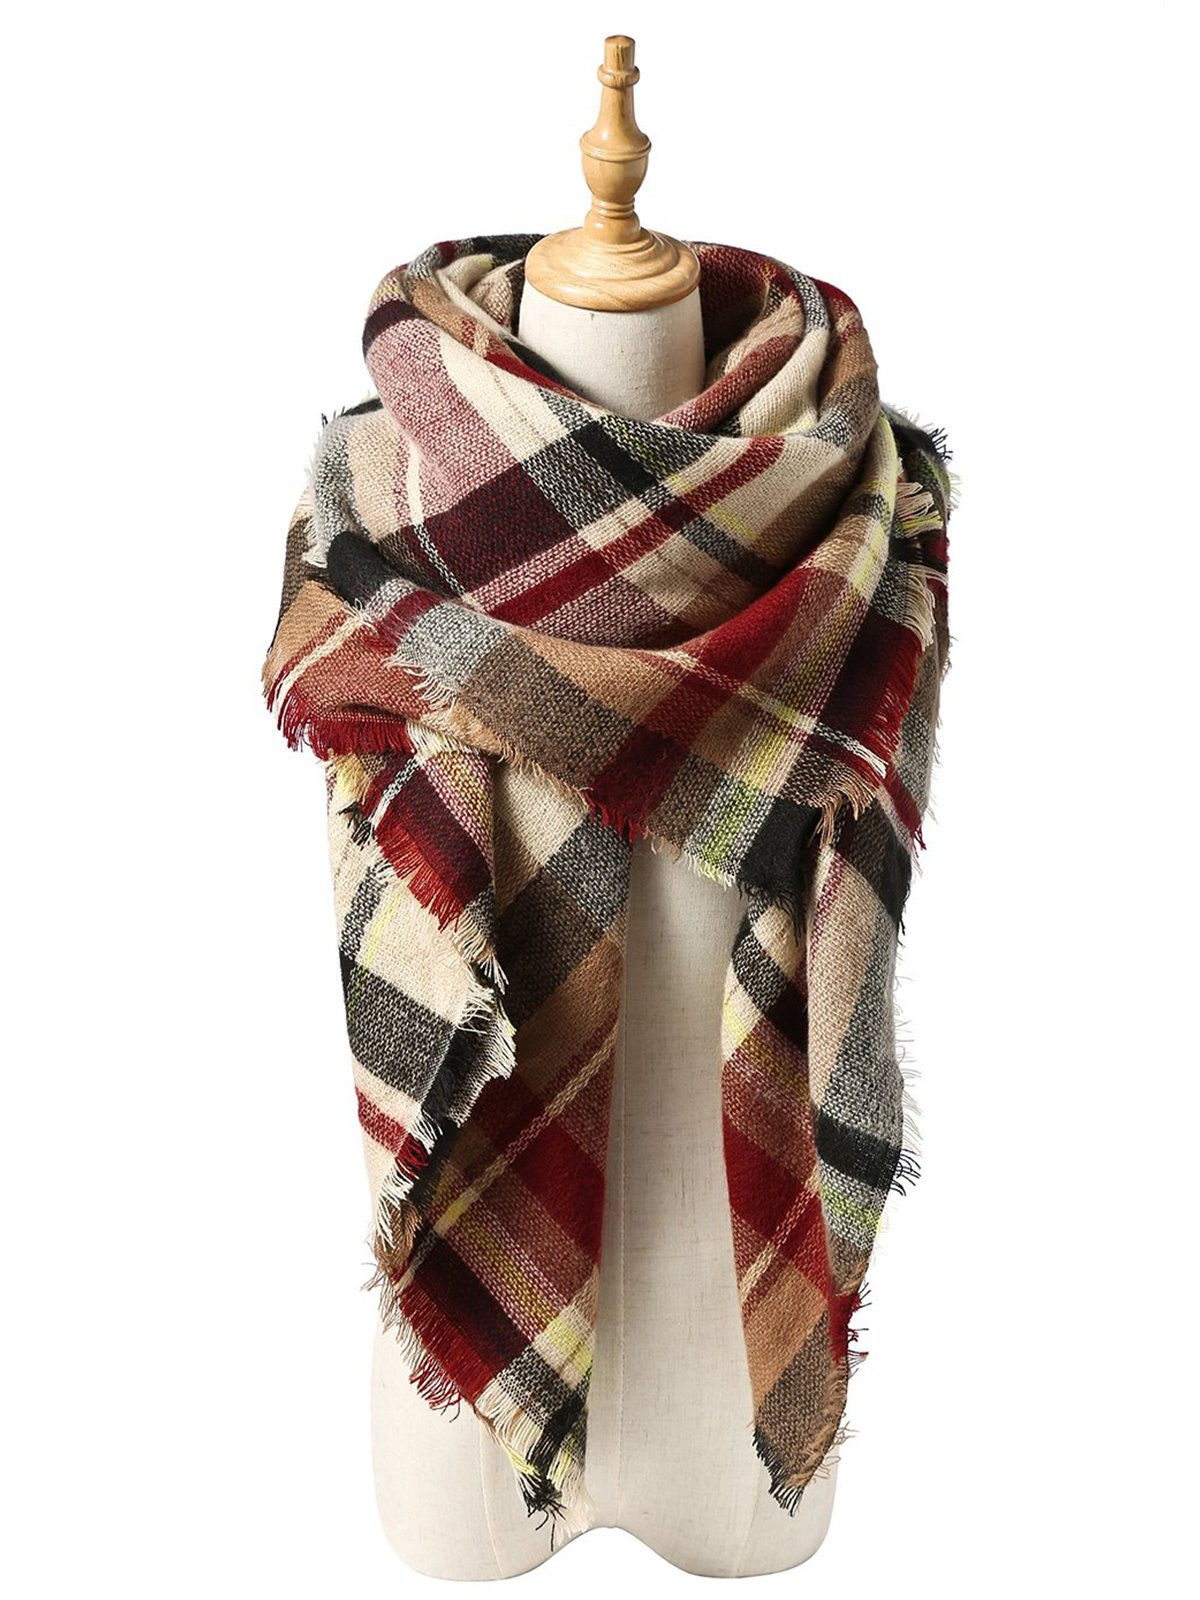 Durio Womens Scarves Winter Warm Scarfs for Women Plaid Blanket Tassel Shawls Wrap Oversized Scarf Light Red